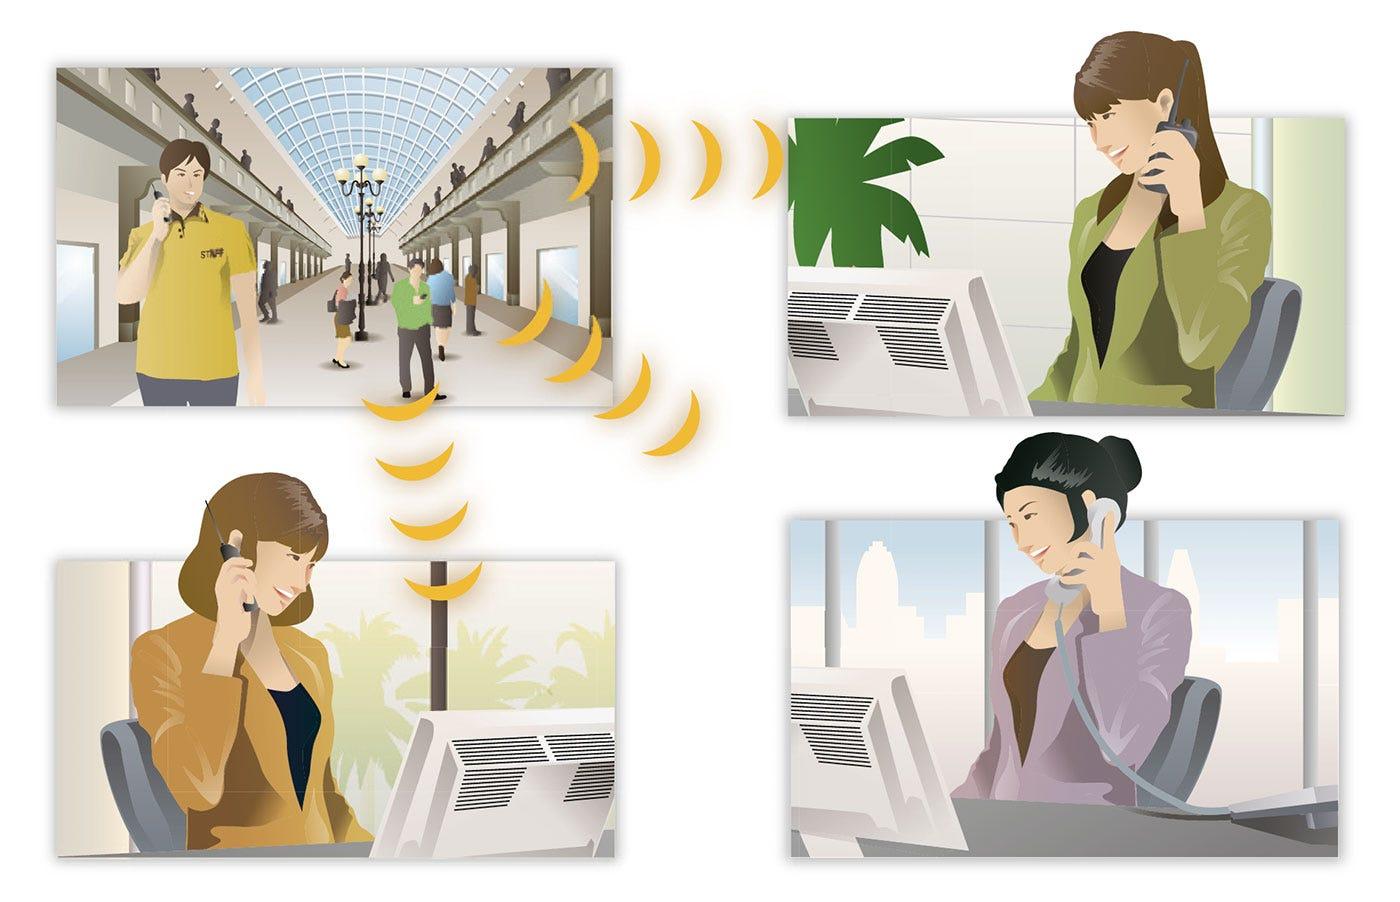 Kommunikation mellan olika platser